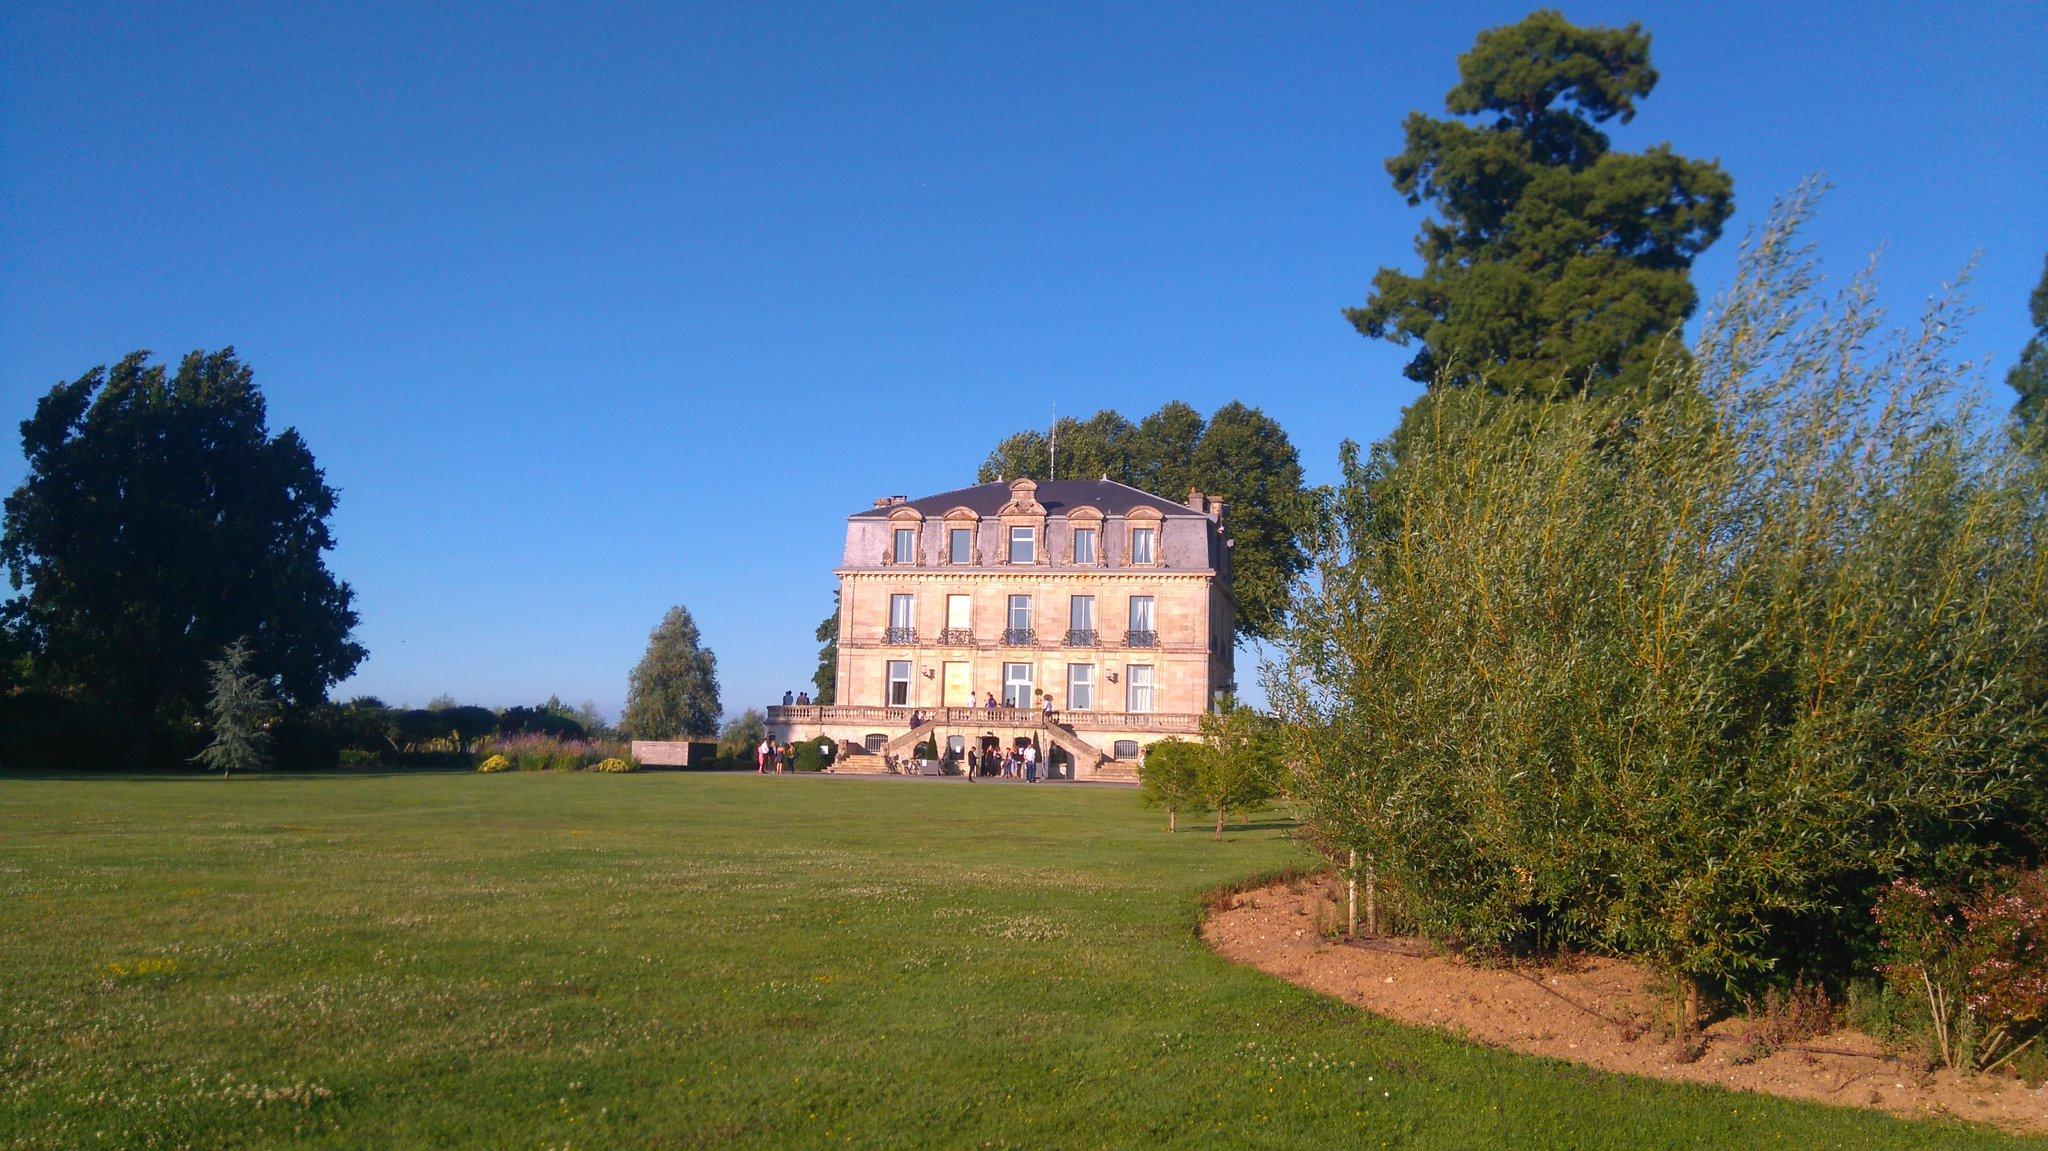 Superbe lieu #ChâteauGrattequina pour fêter #Apacom20ans https://t.co/sFZk5WzsOJ